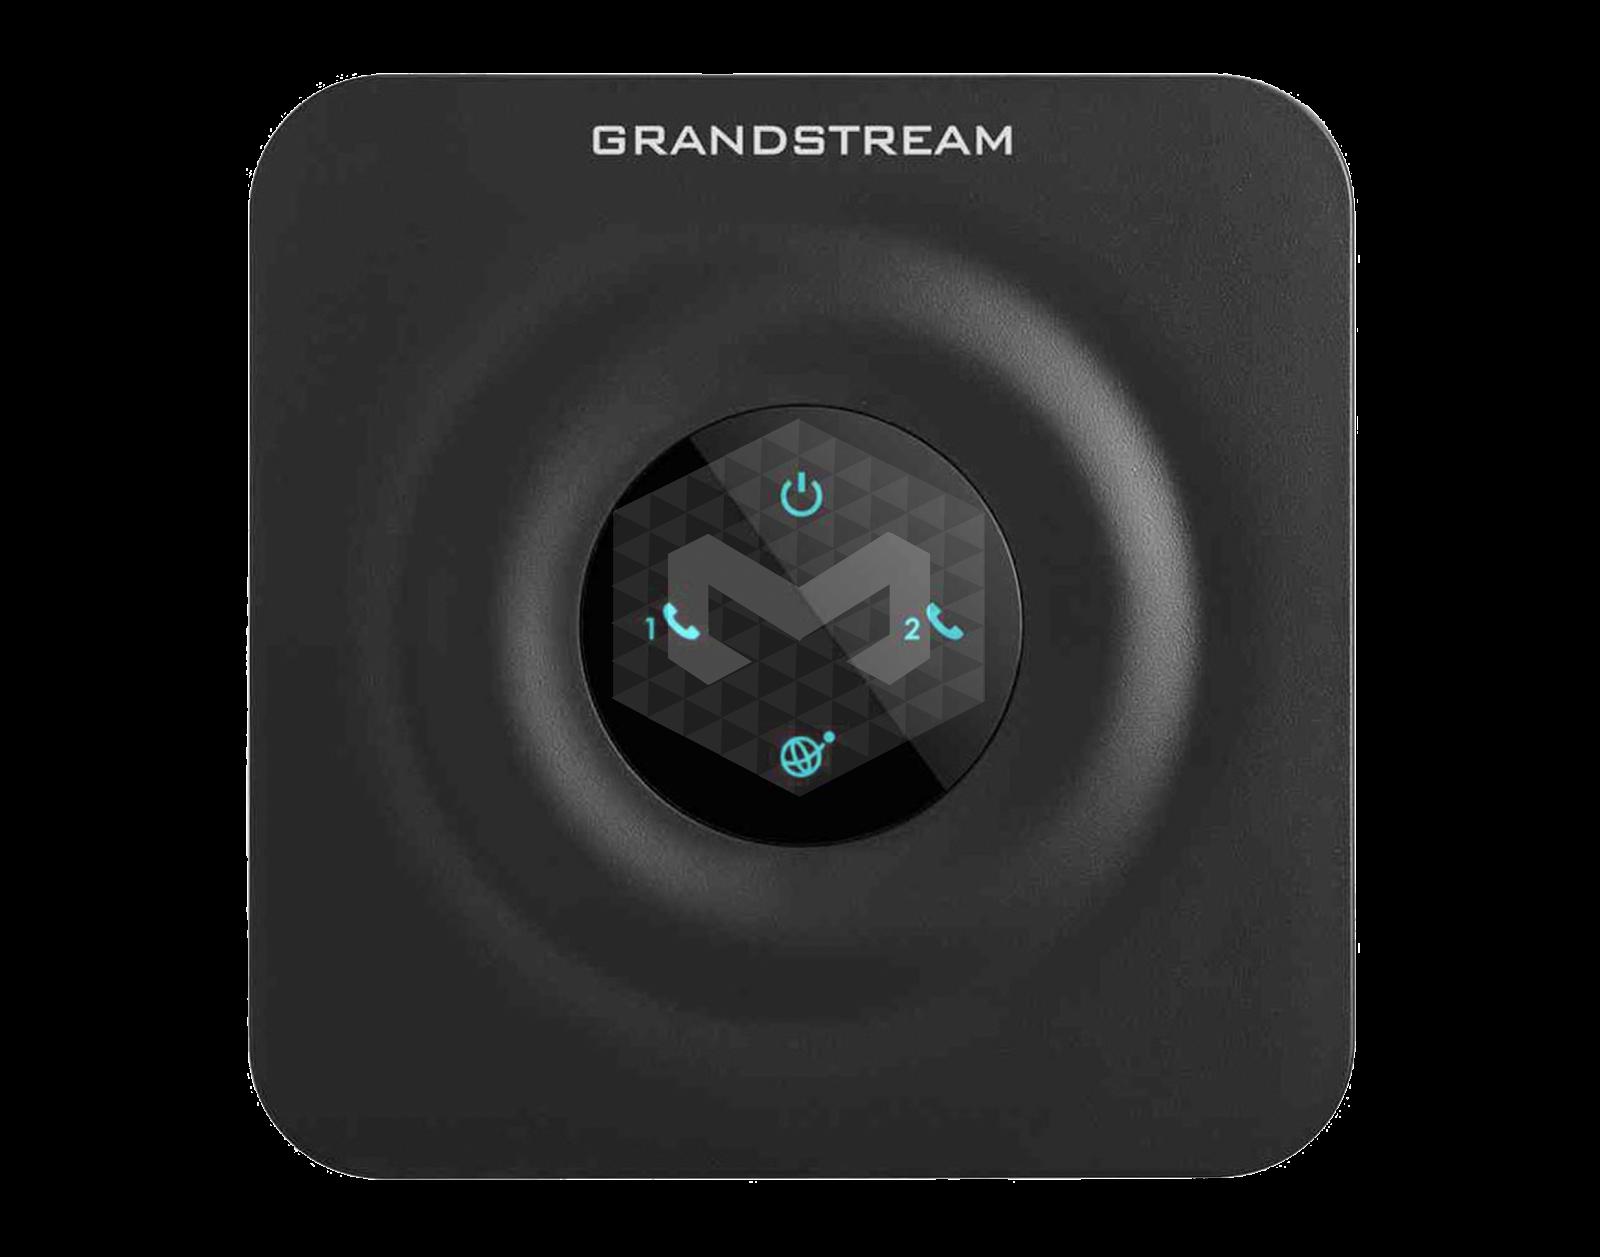 ht802-grandstream-2fxs